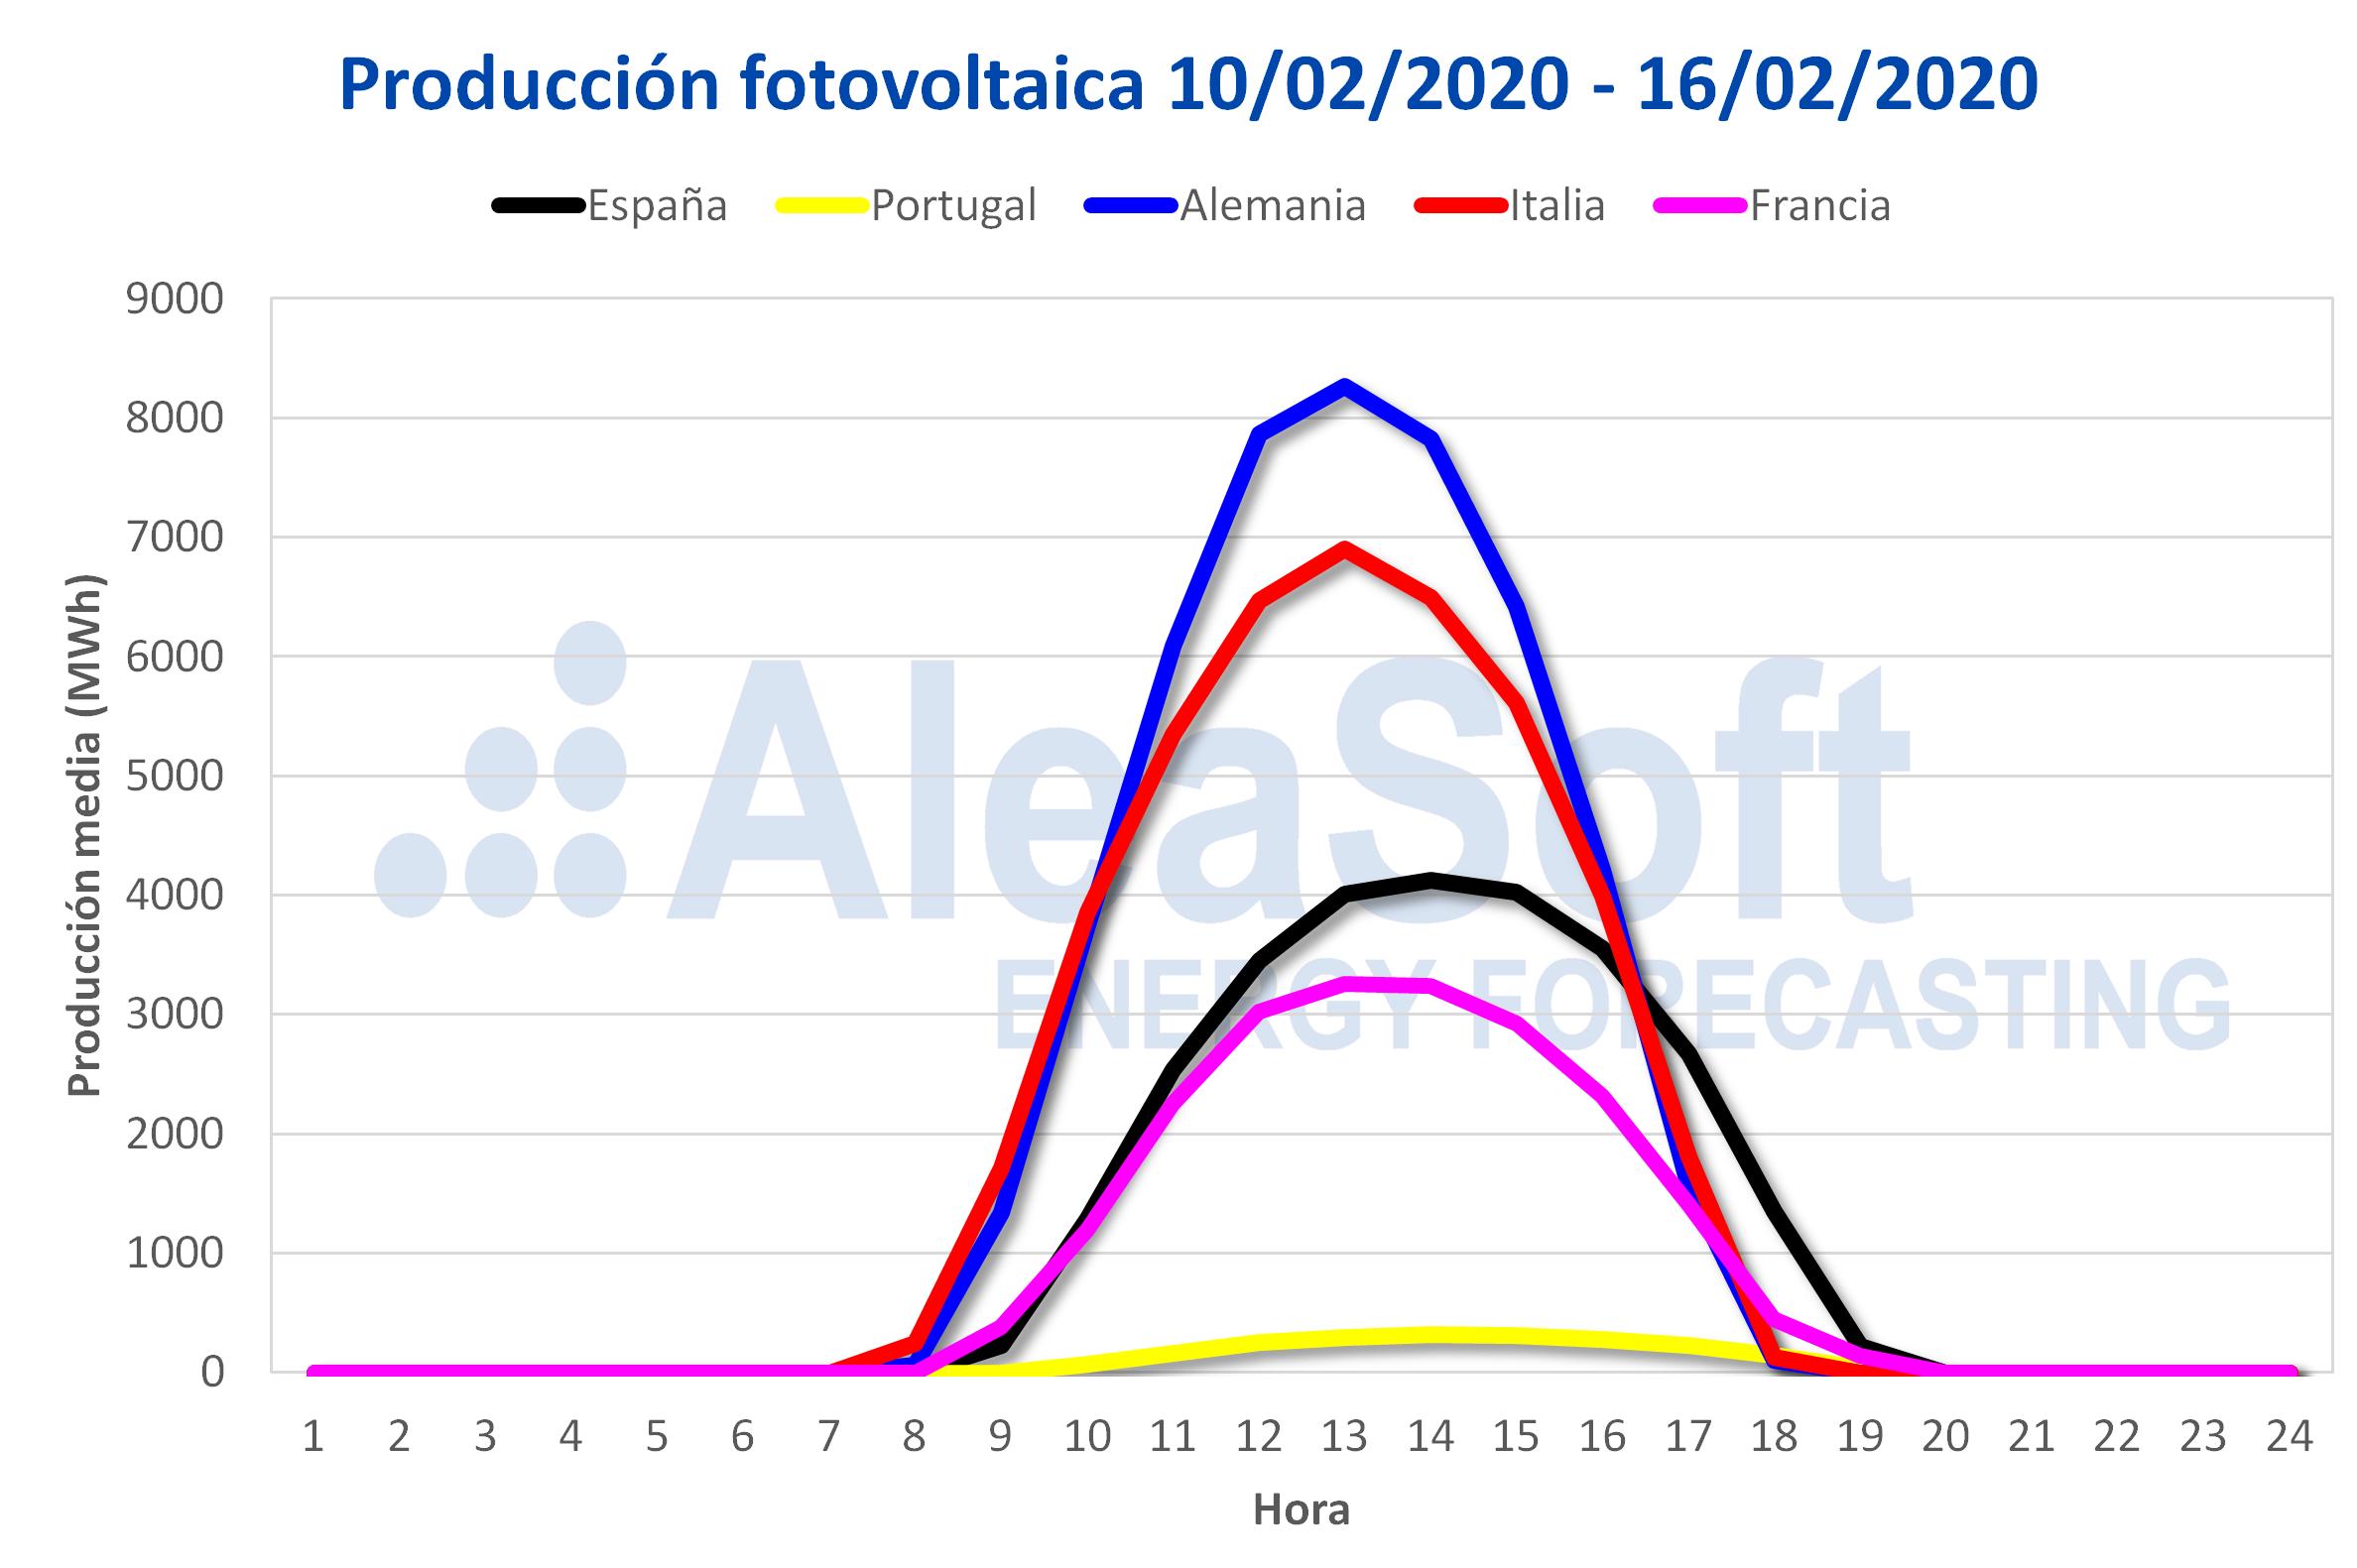 https://aleasoft.com/wp-content/uploads/2020/02/20200217-AleaSoft-Perfil-produccion-solar-fotovoltaica-Europa.png